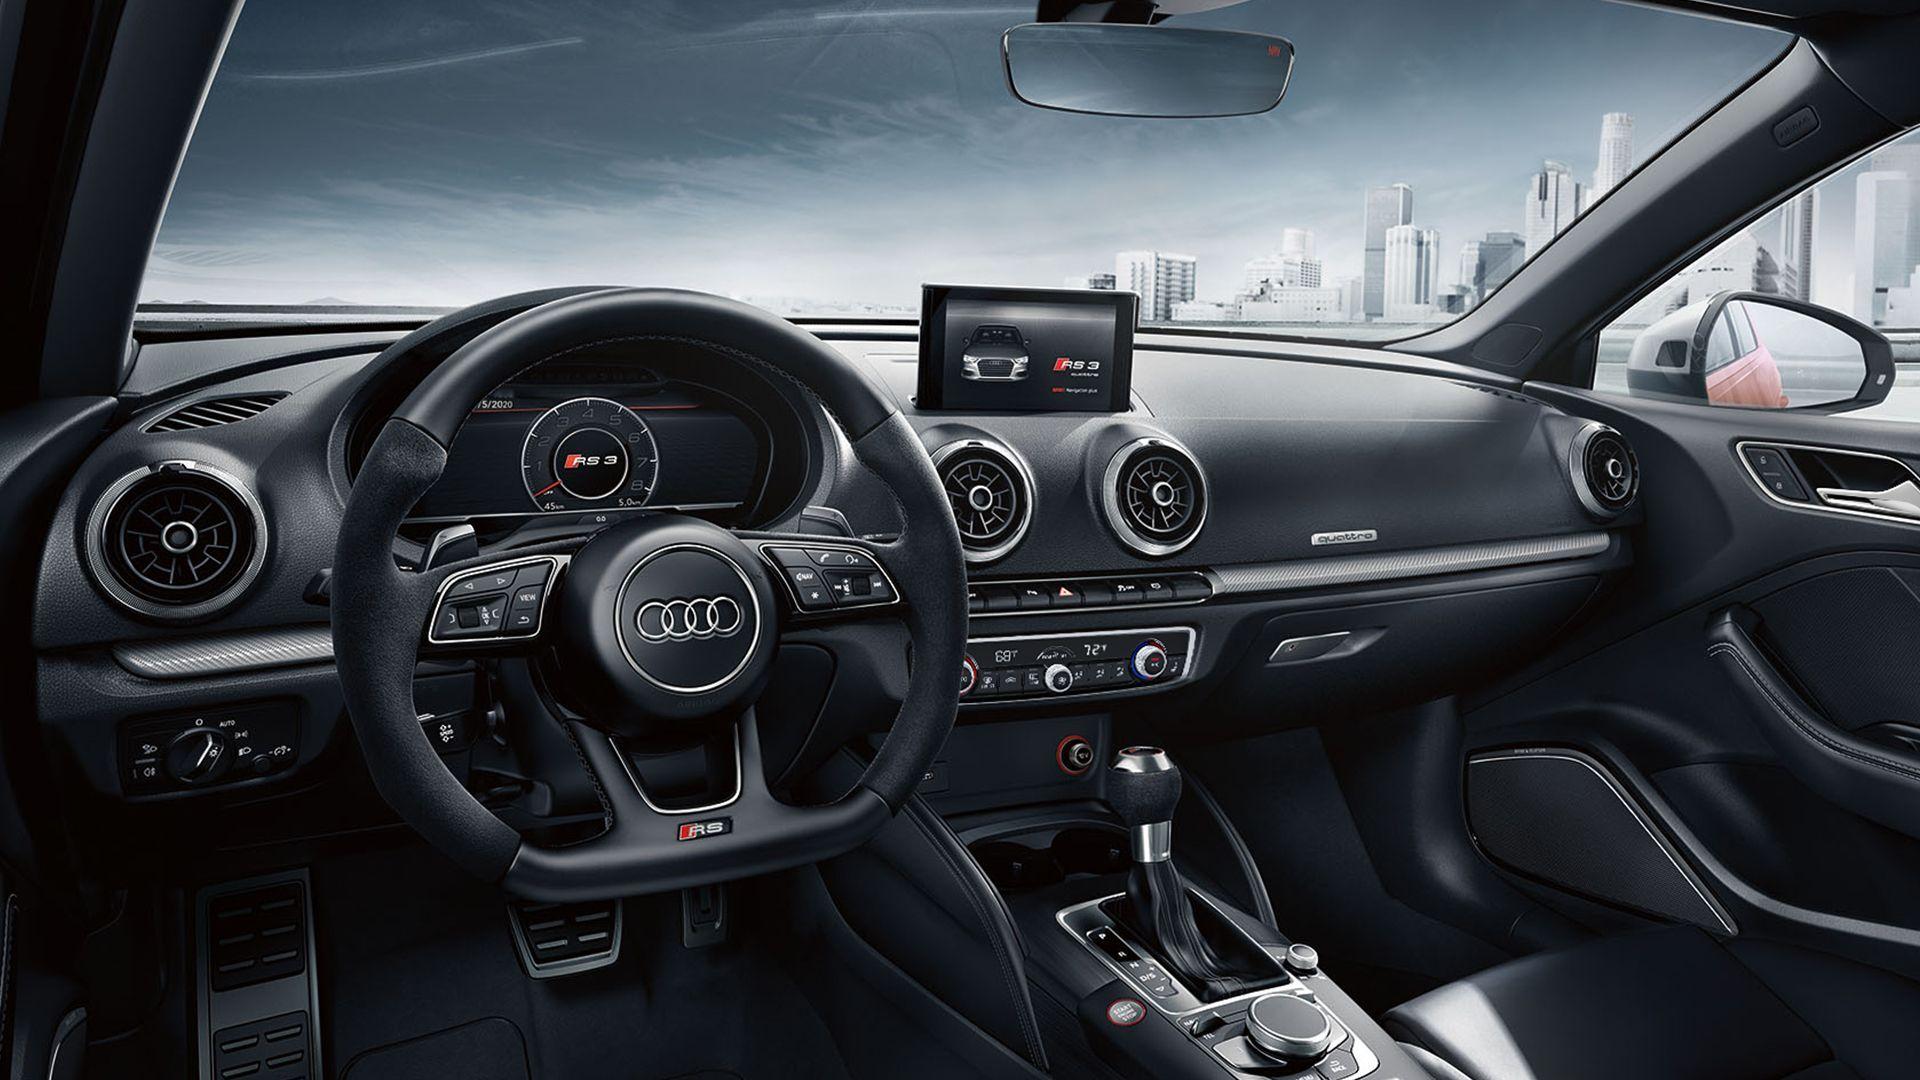 2020 Audi Rs3 Standard Quattro All Wheel Drive Audi Usa